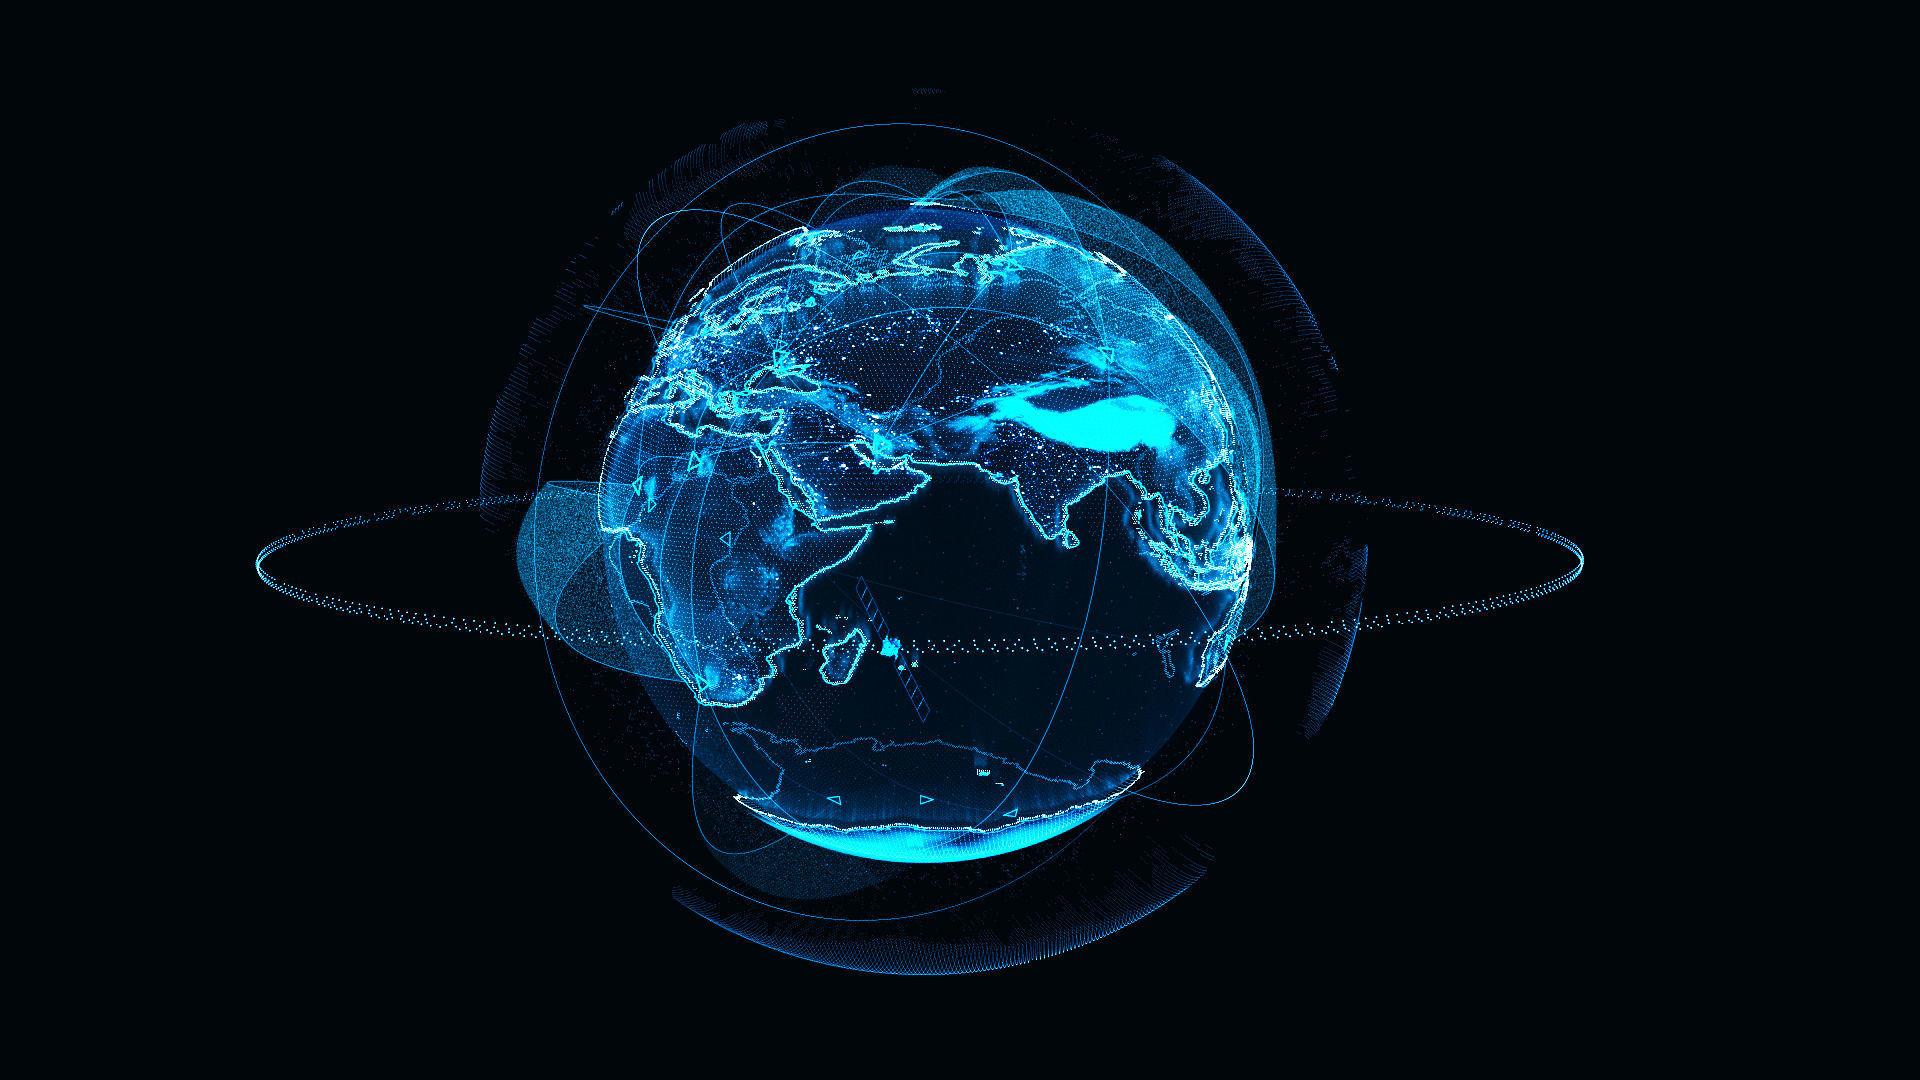 Animated Hologram Planet Earth v4